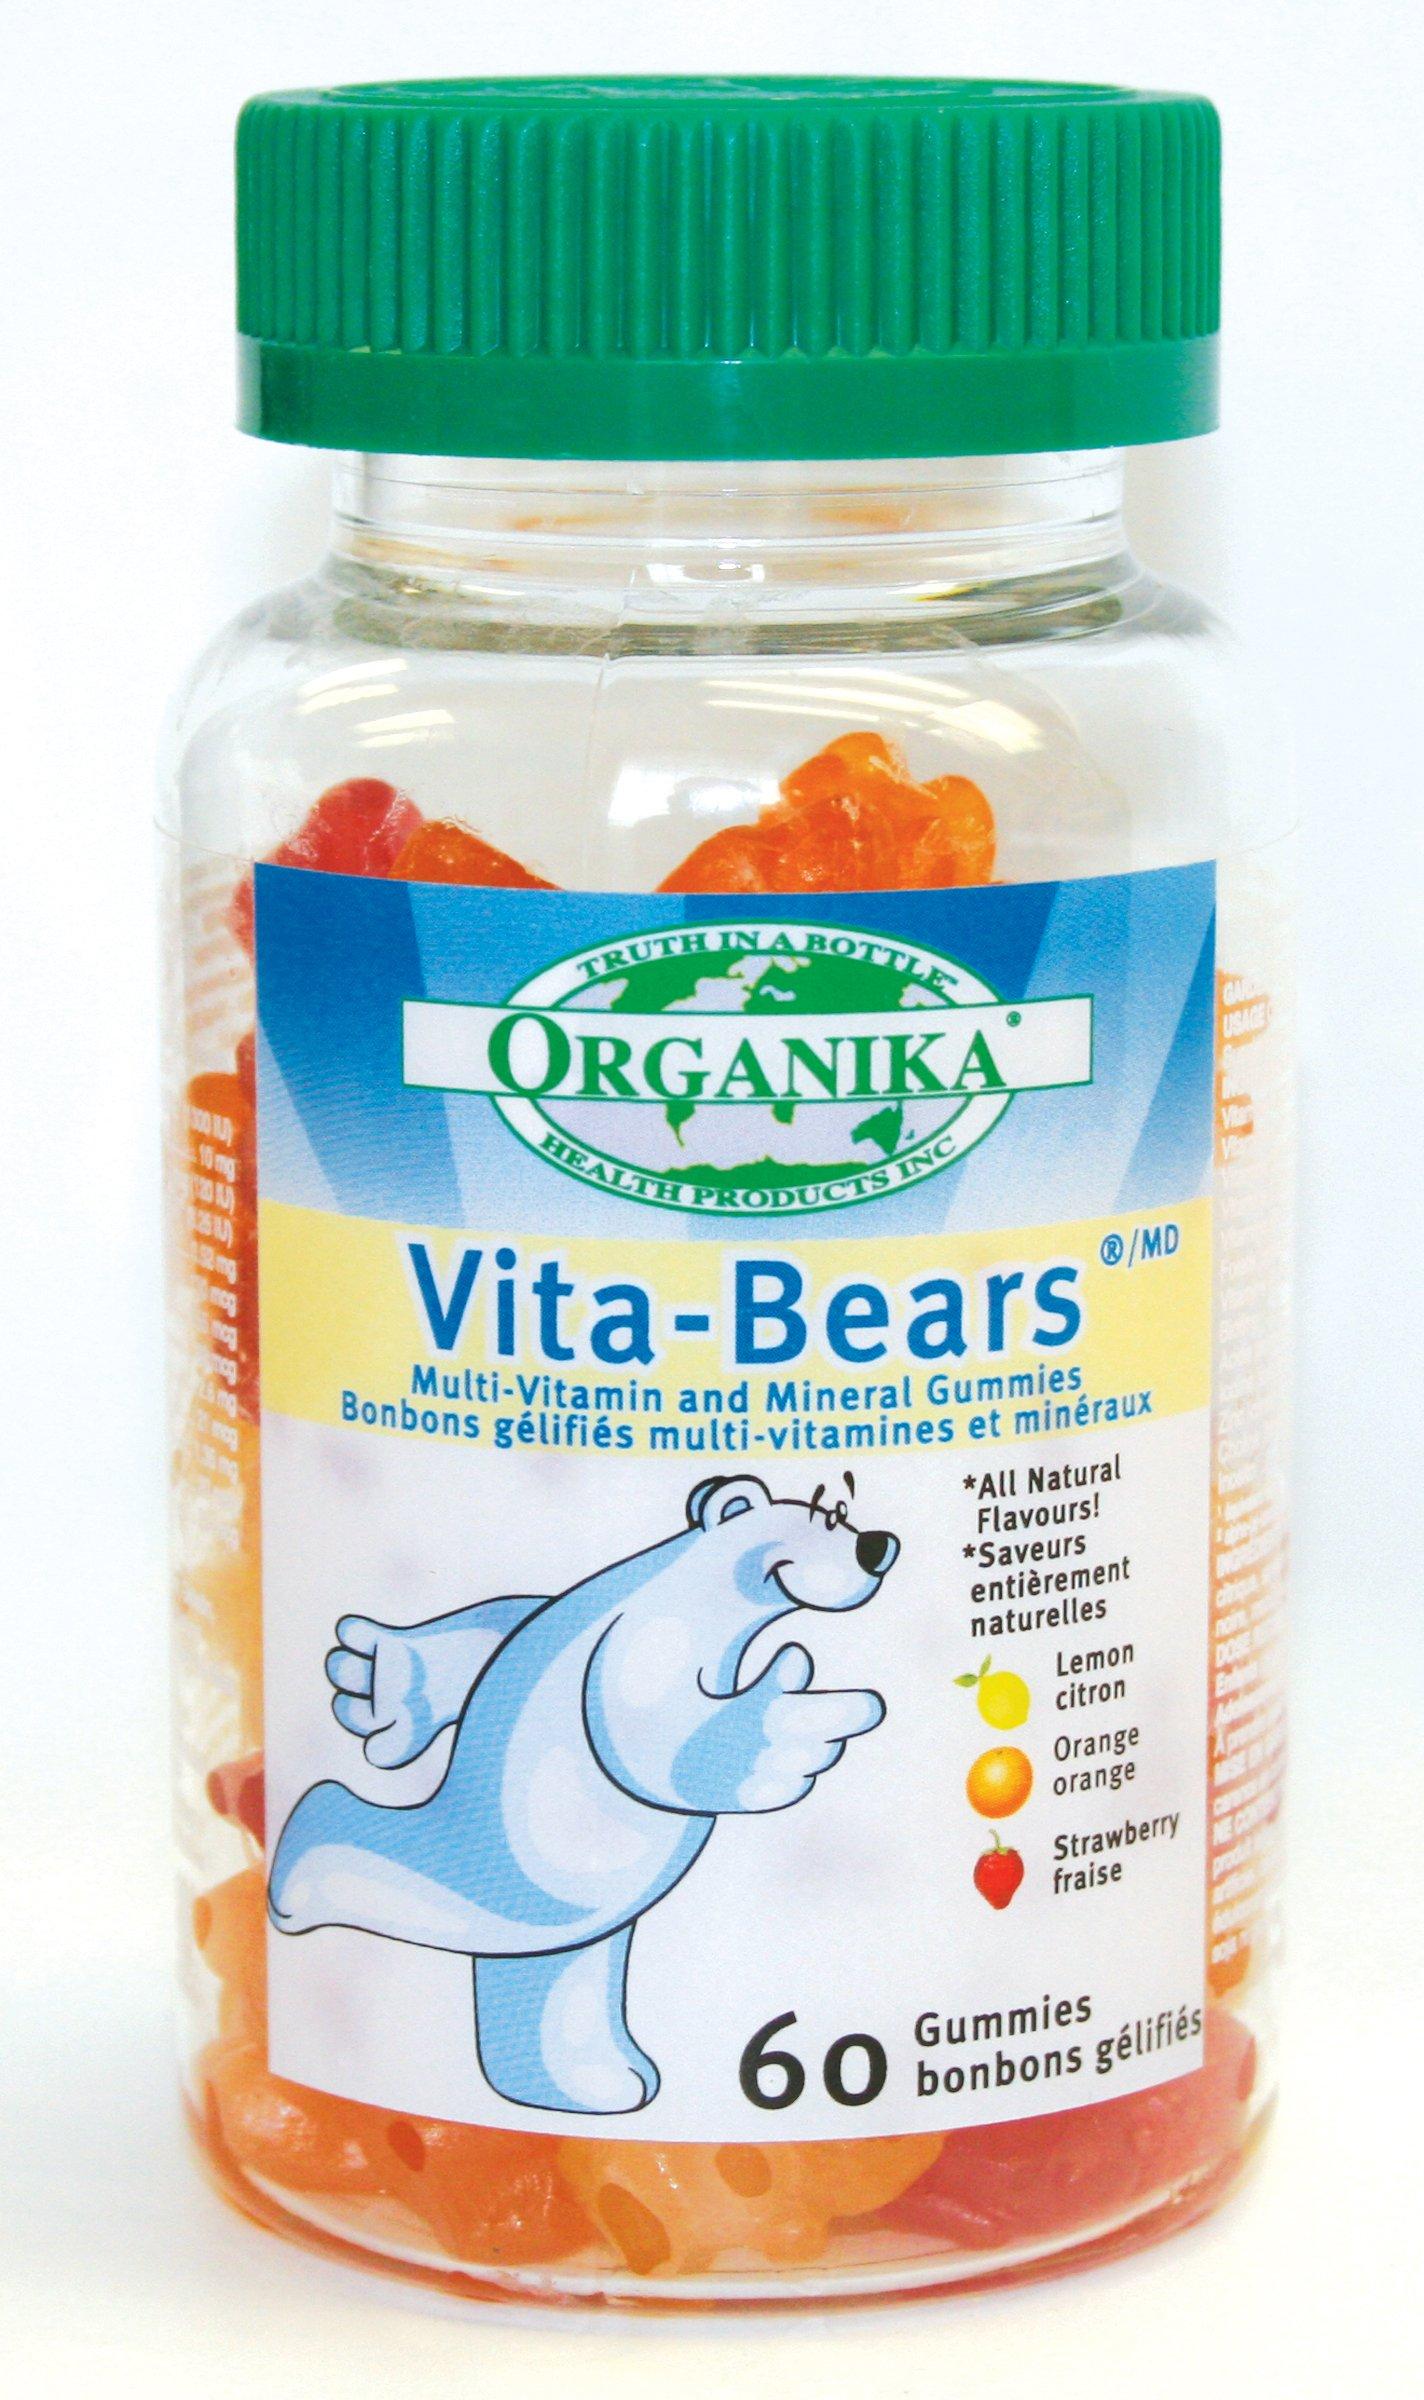 Organika Vita-Bears Multivitamin, 60 Gummies